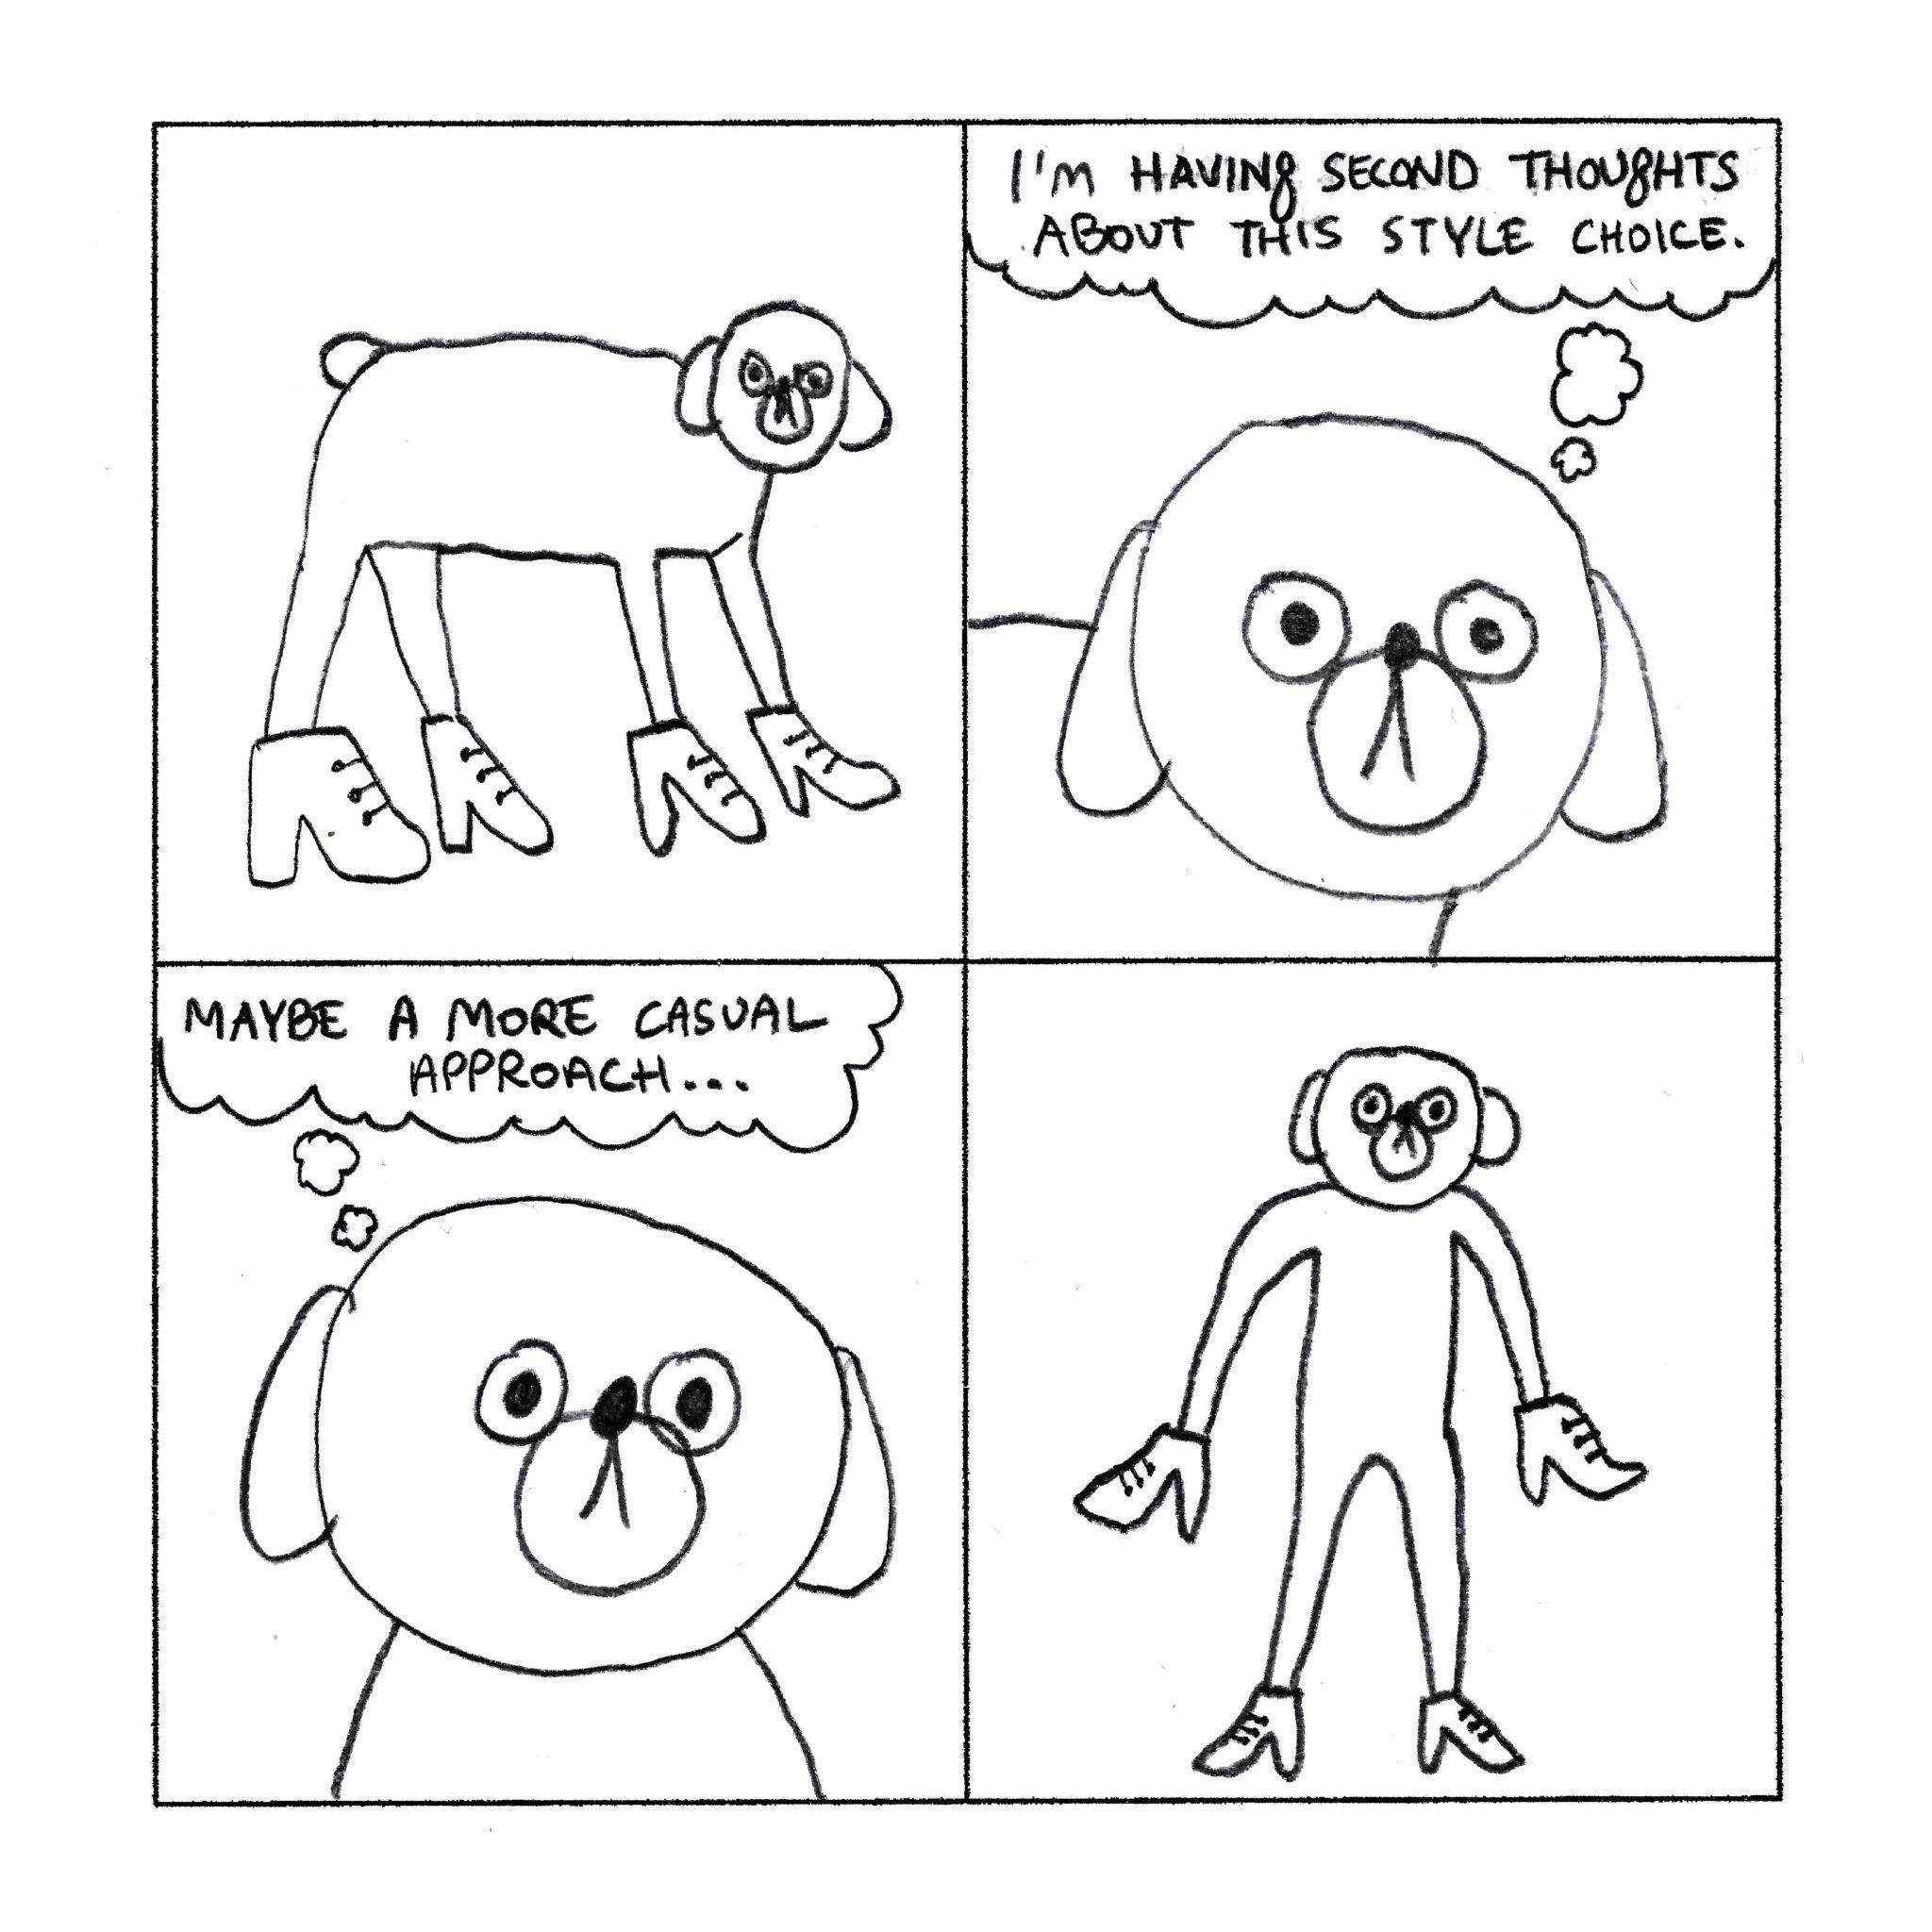 Dog Comics 11-20 - Page 1